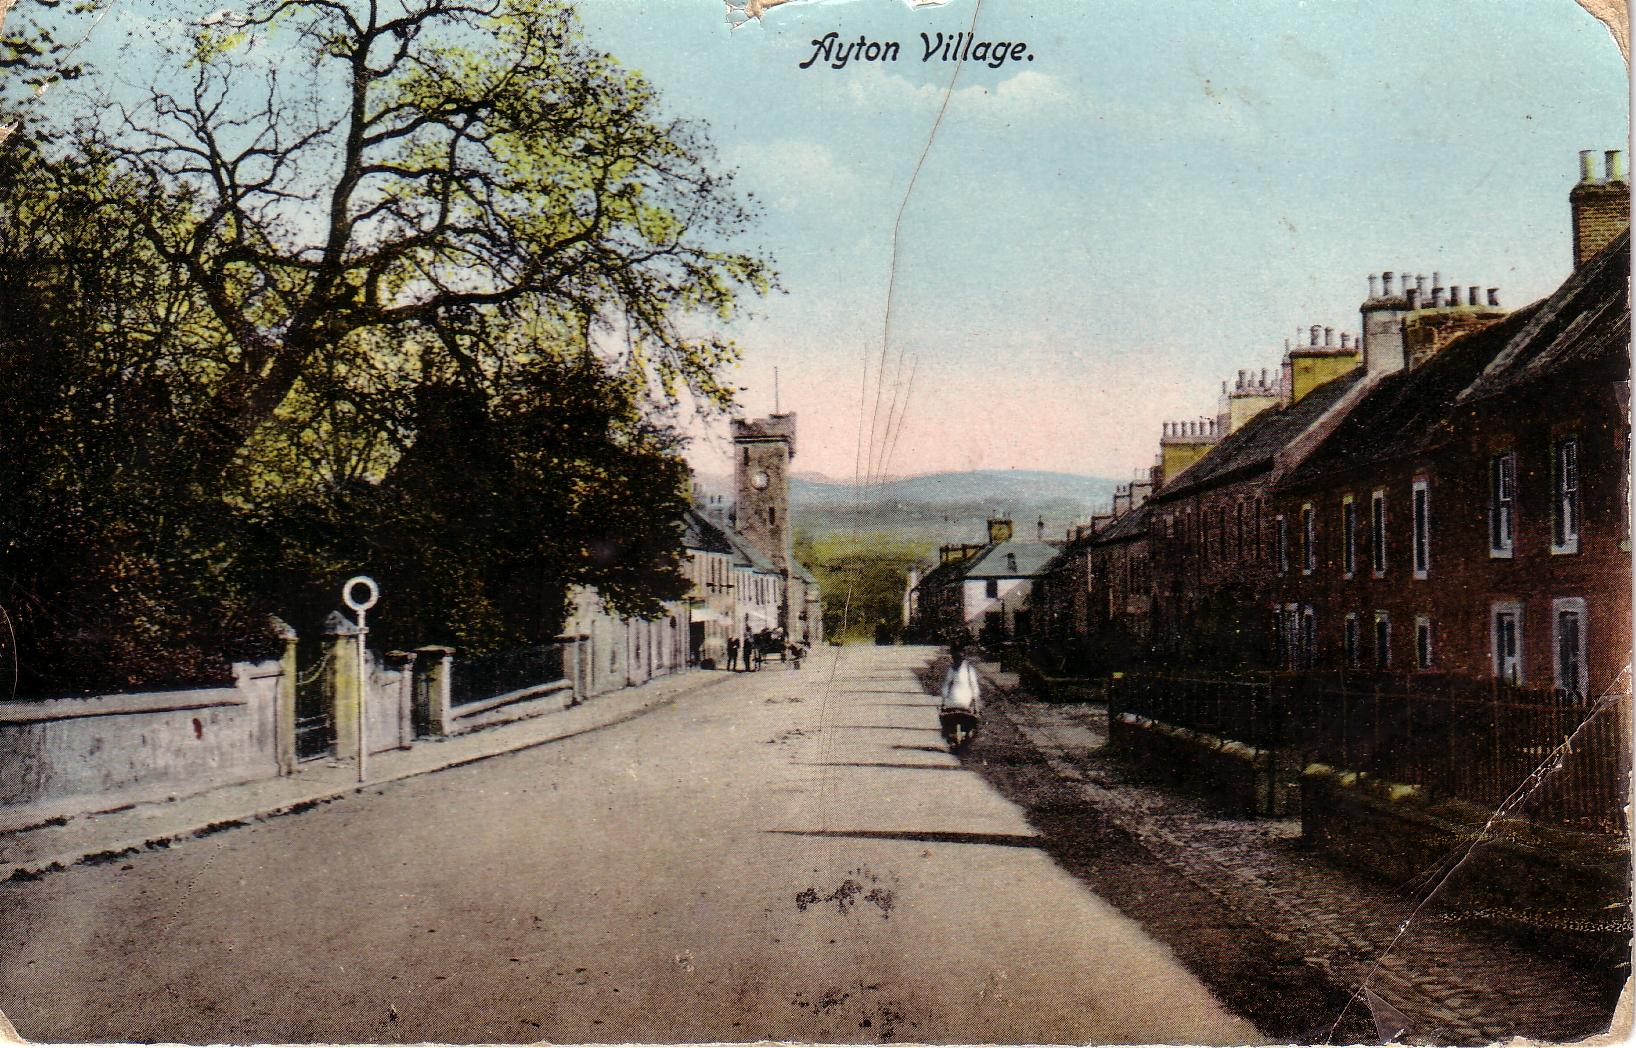 Ayton Village